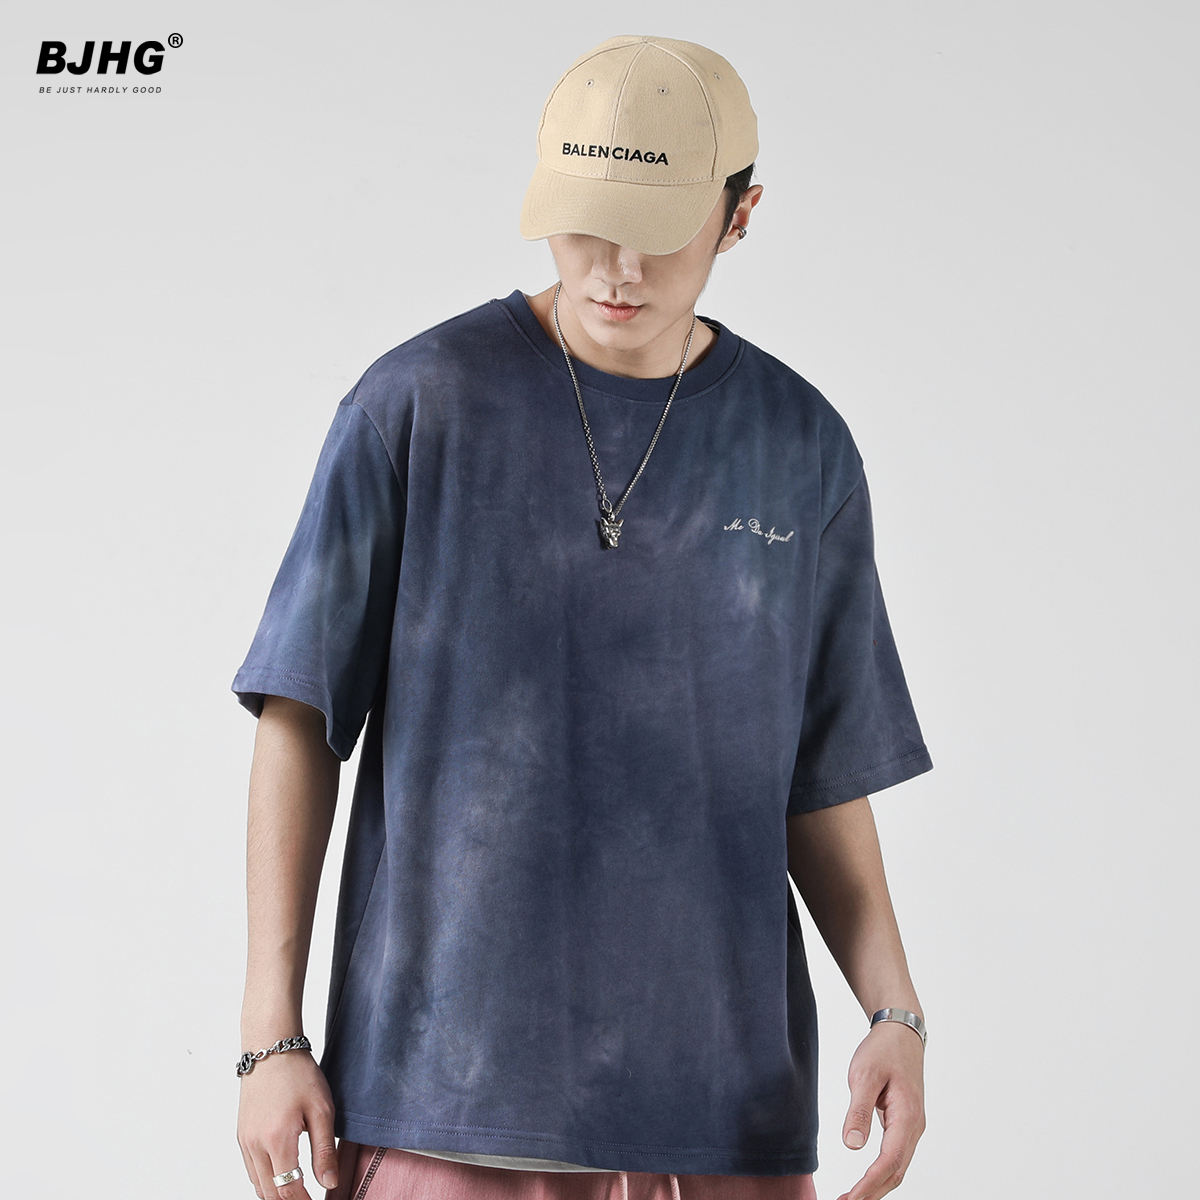 BJHG不计后果 夏半袖T恤男潮牌复古做旧磨白宽松刺绣圆领短袖丅恤